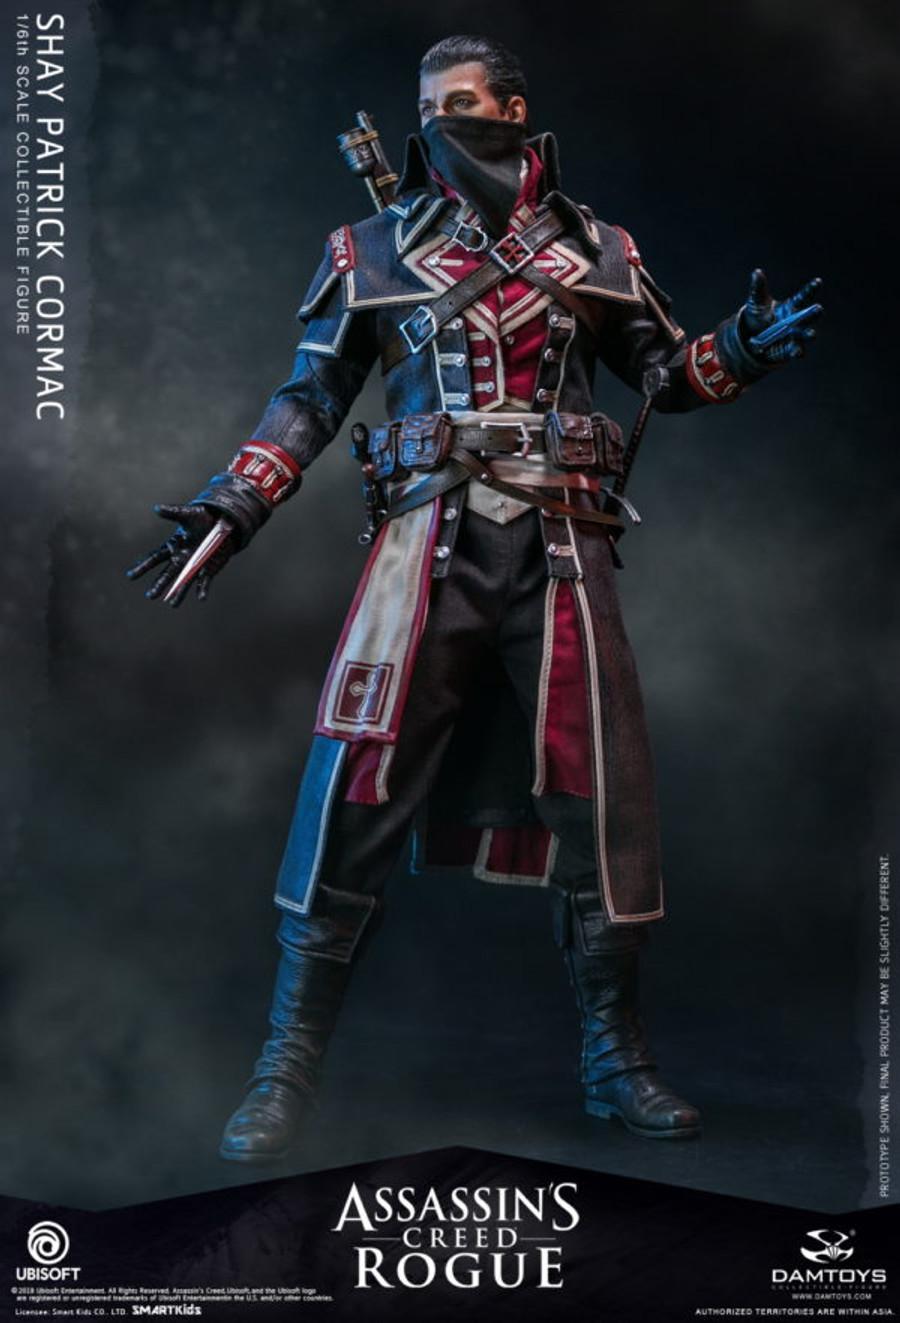 DAM Toys - Assassin's Creed: Shay Patrick Cormac